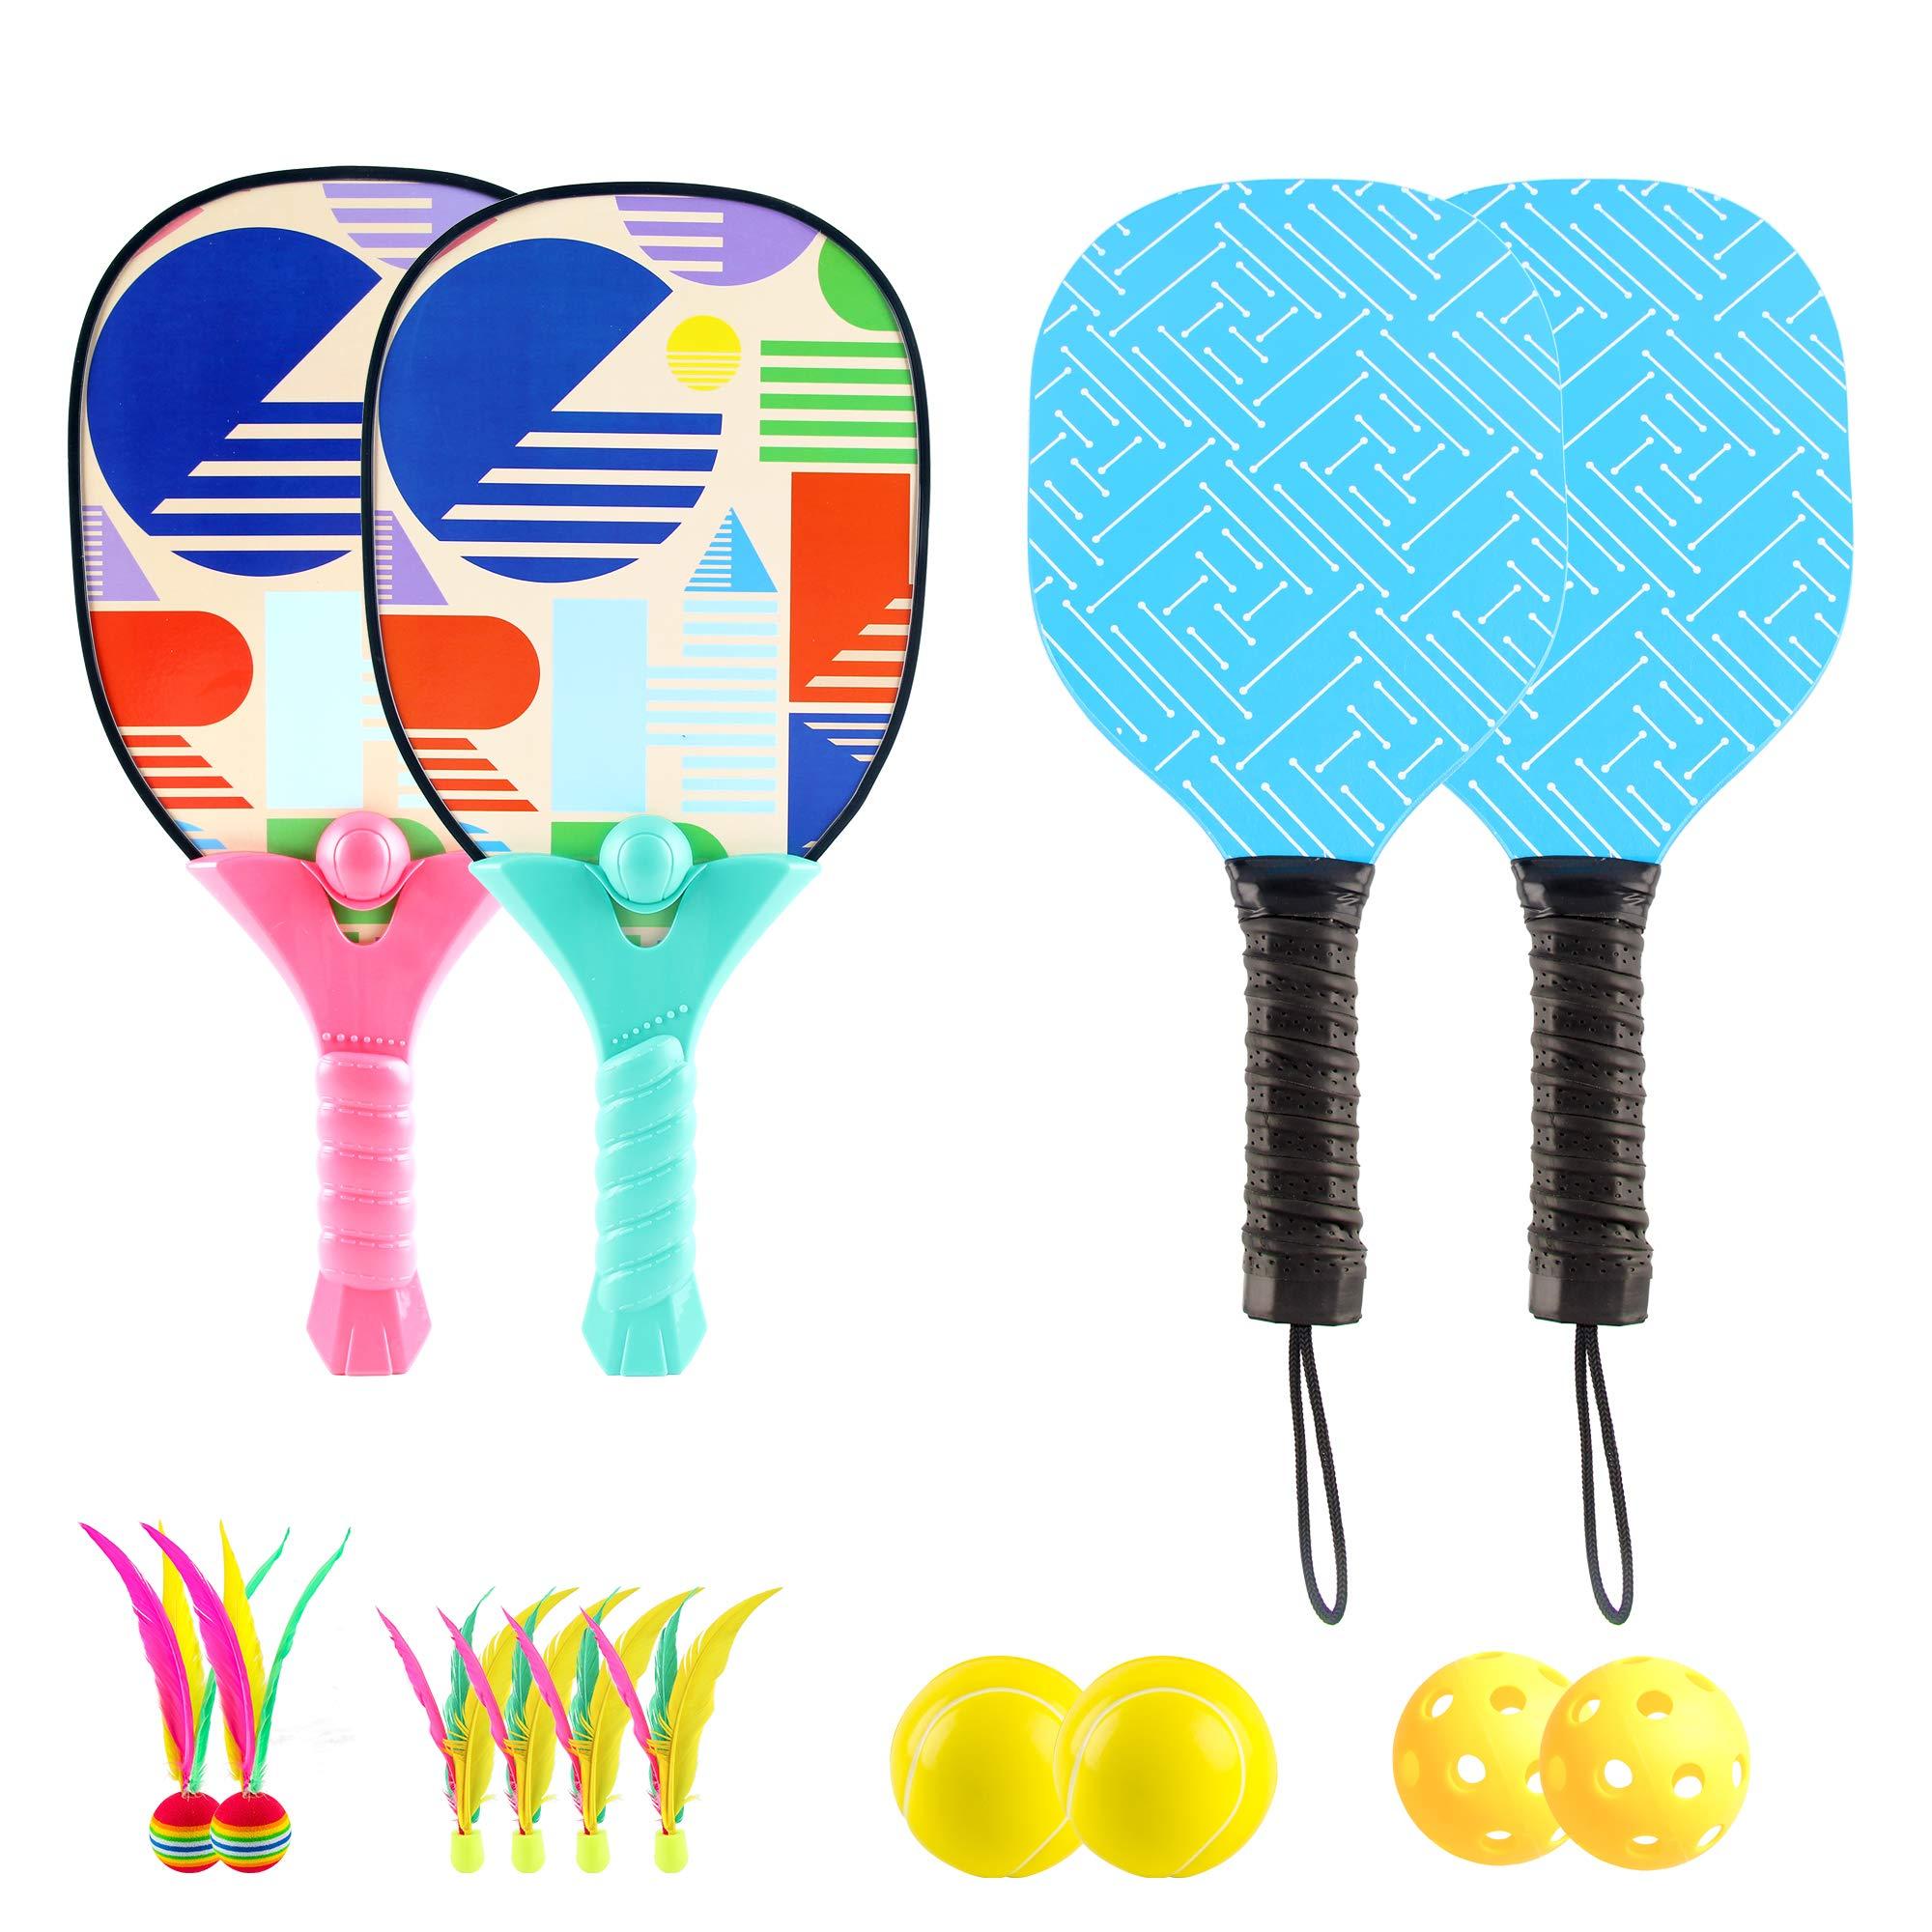 GS CHIER Pickleball Beach Paddle Ball Game Kits for Ki -FSLX